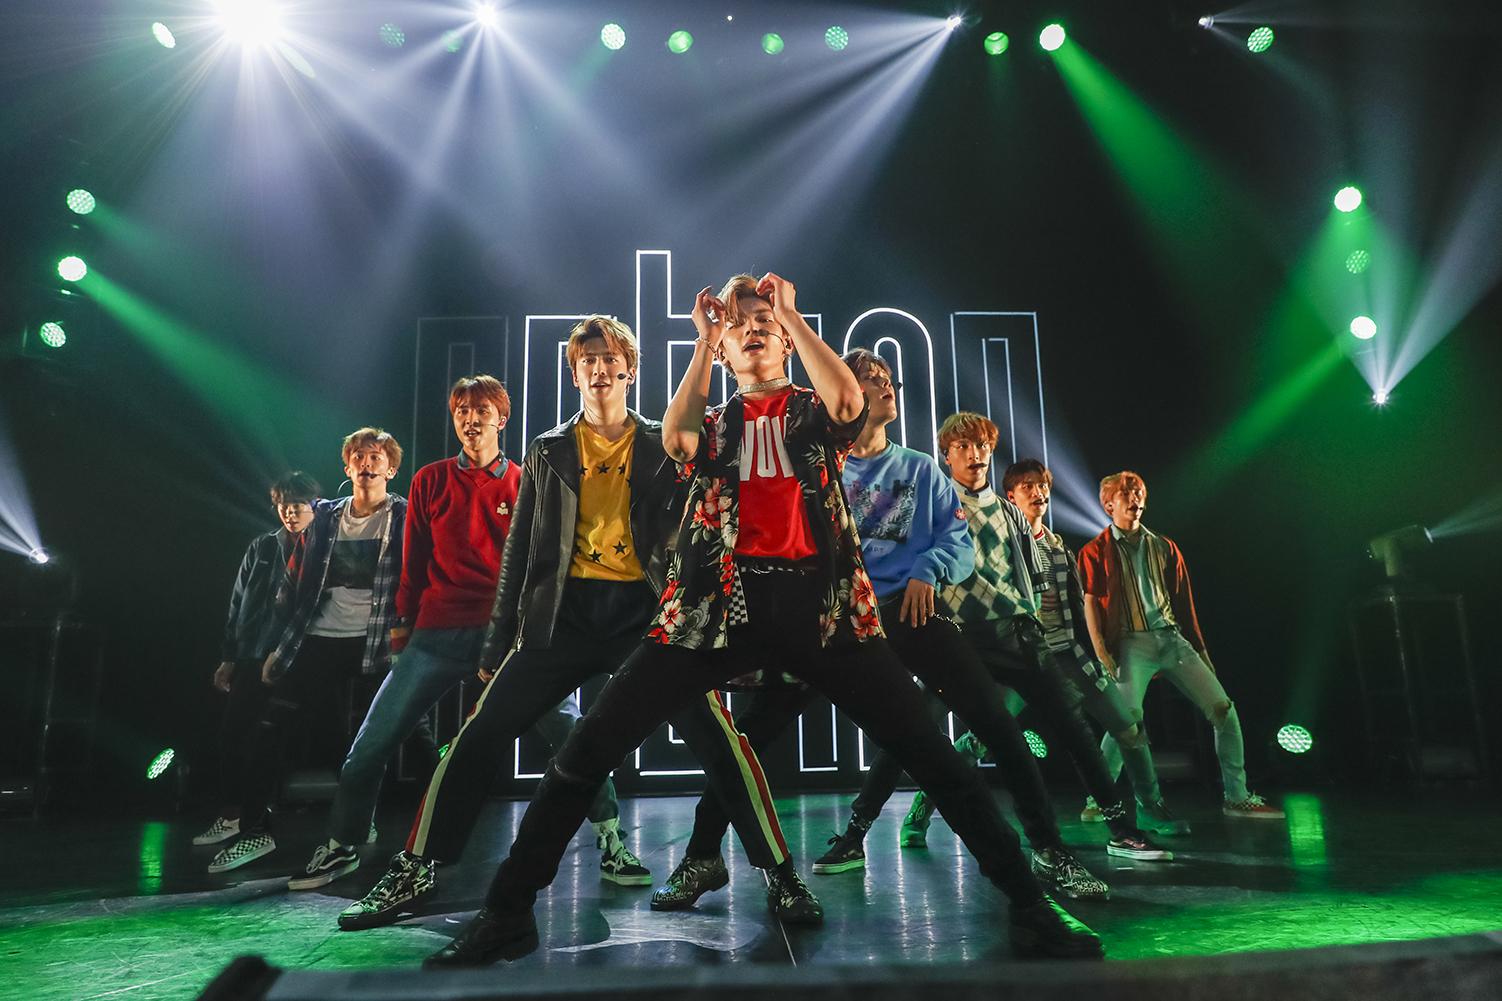 NCT 127、日本活動へ意気込み「新しい繋がりを作りたい!」 ショーケースラスト公演で2万人熱狂